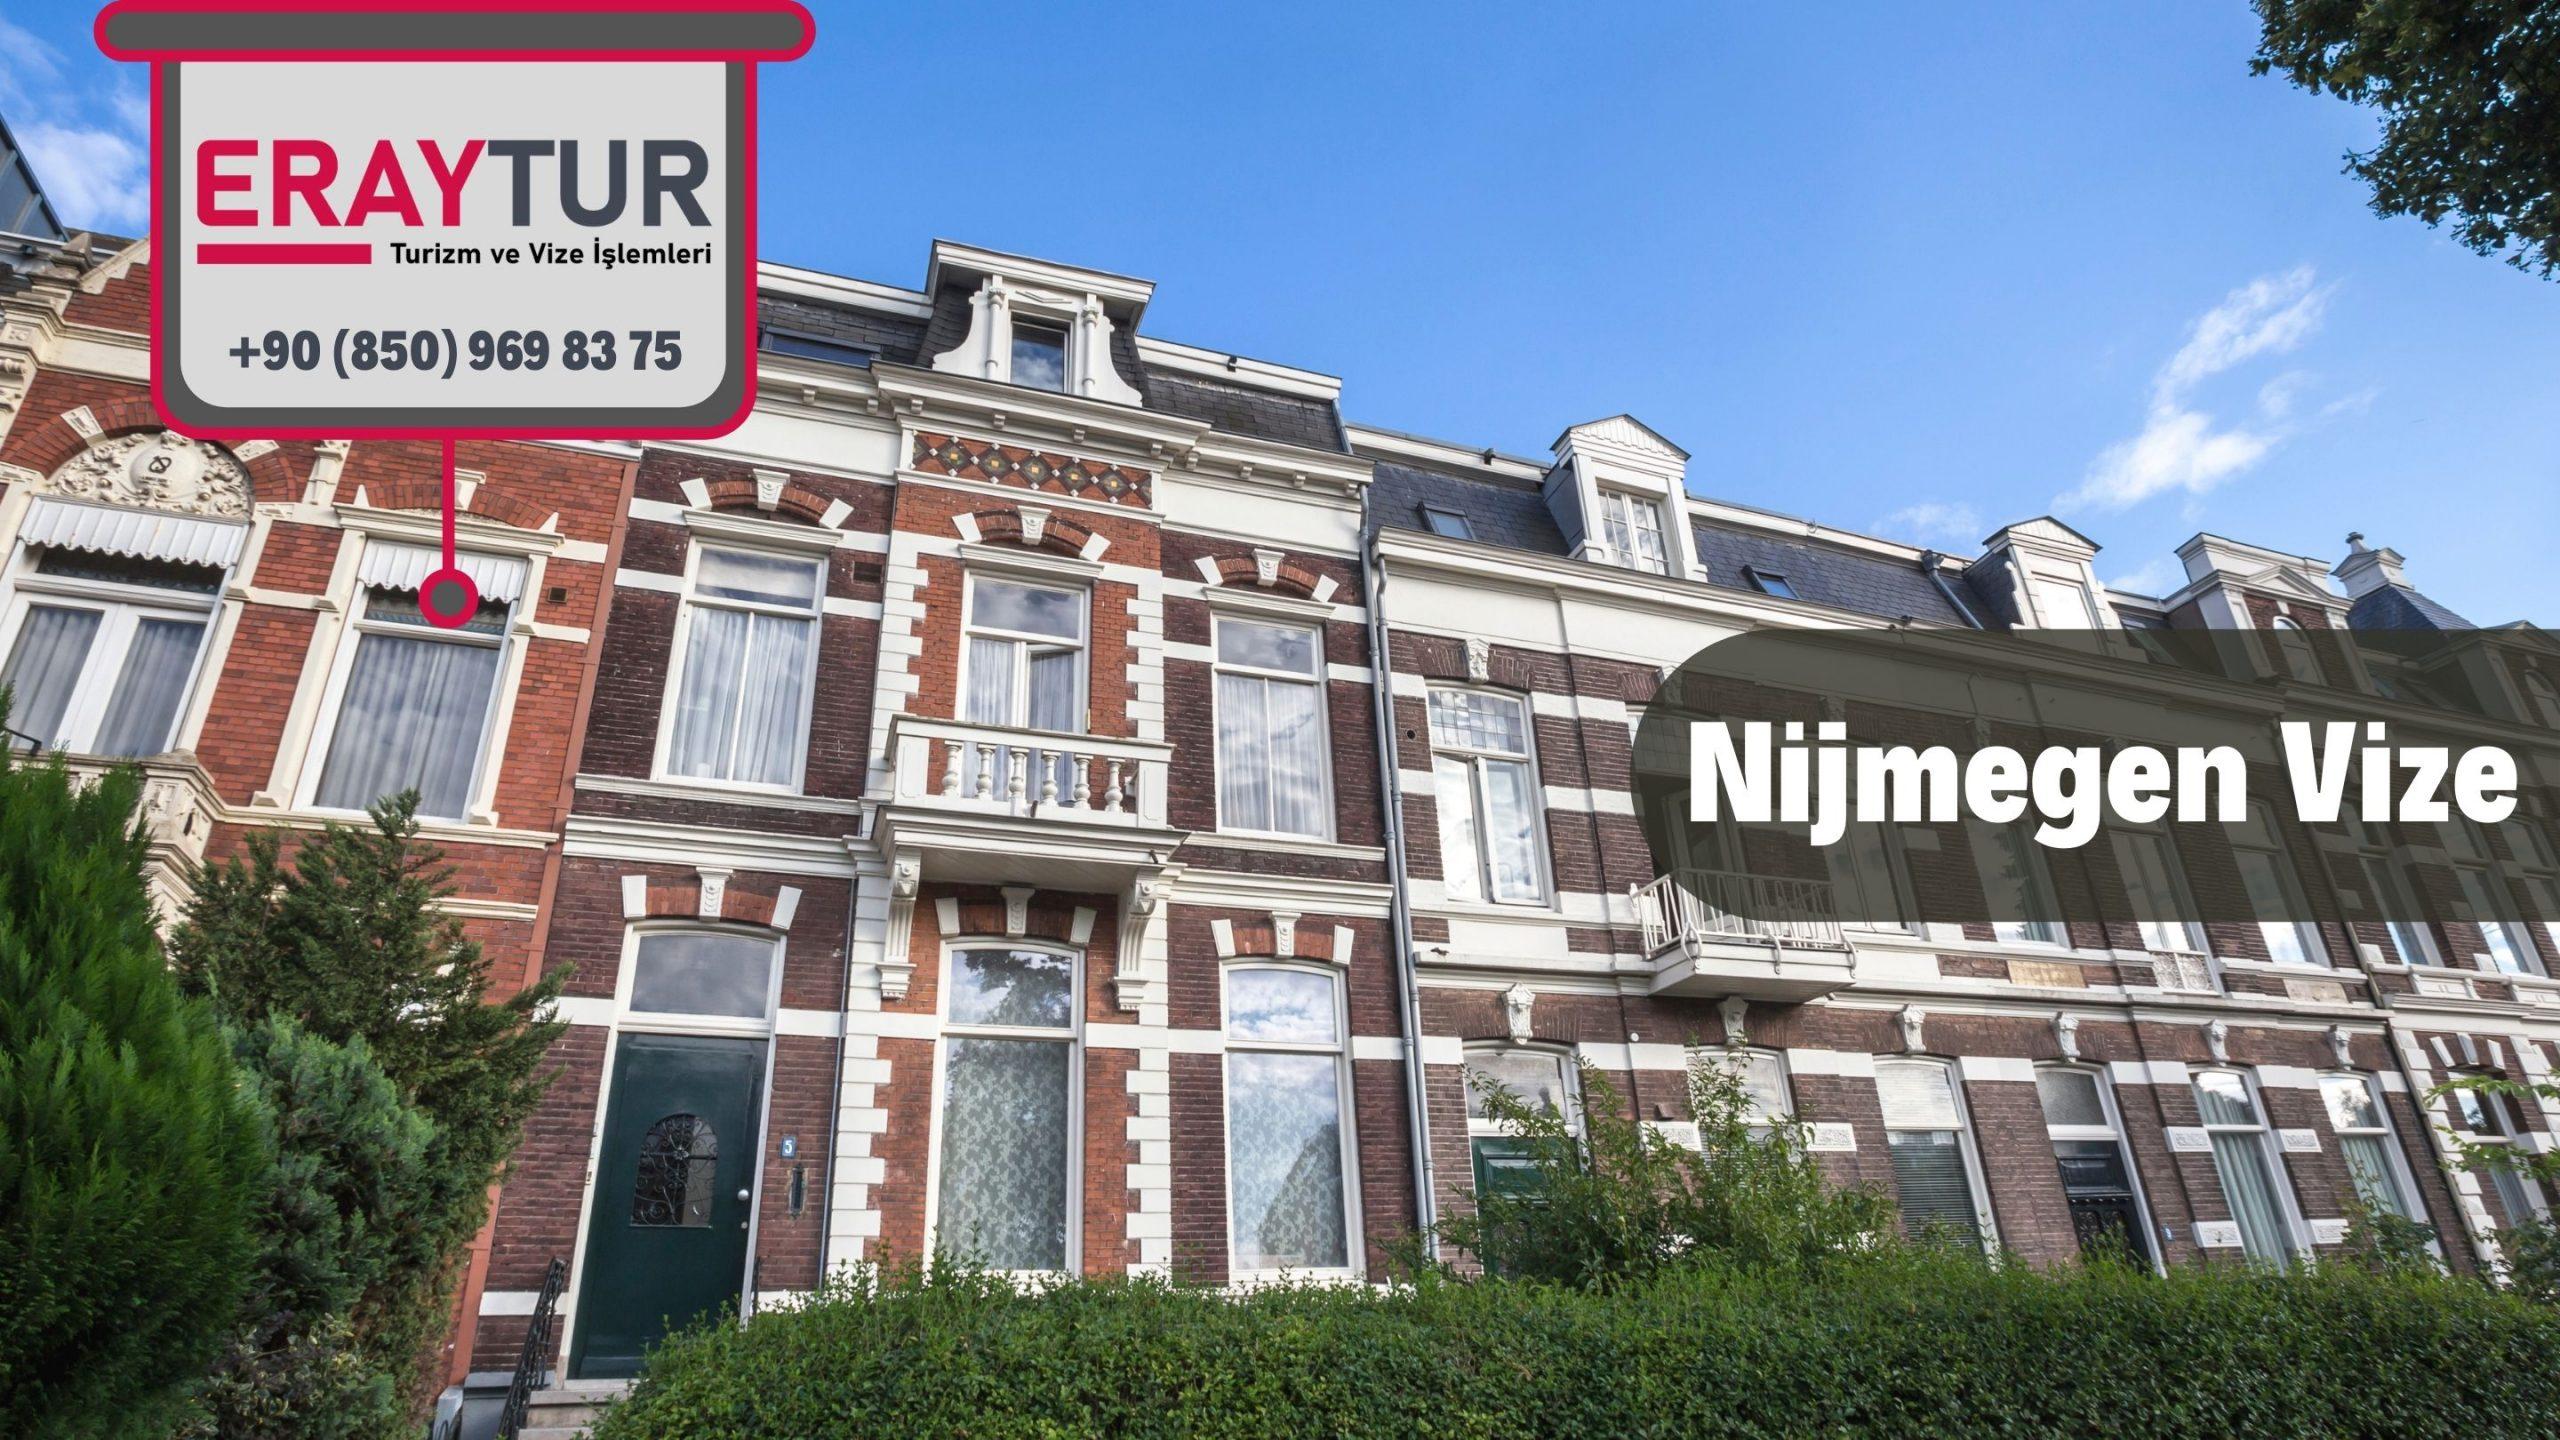 Nijmegen Vize 1 – nijmegen vize scaled